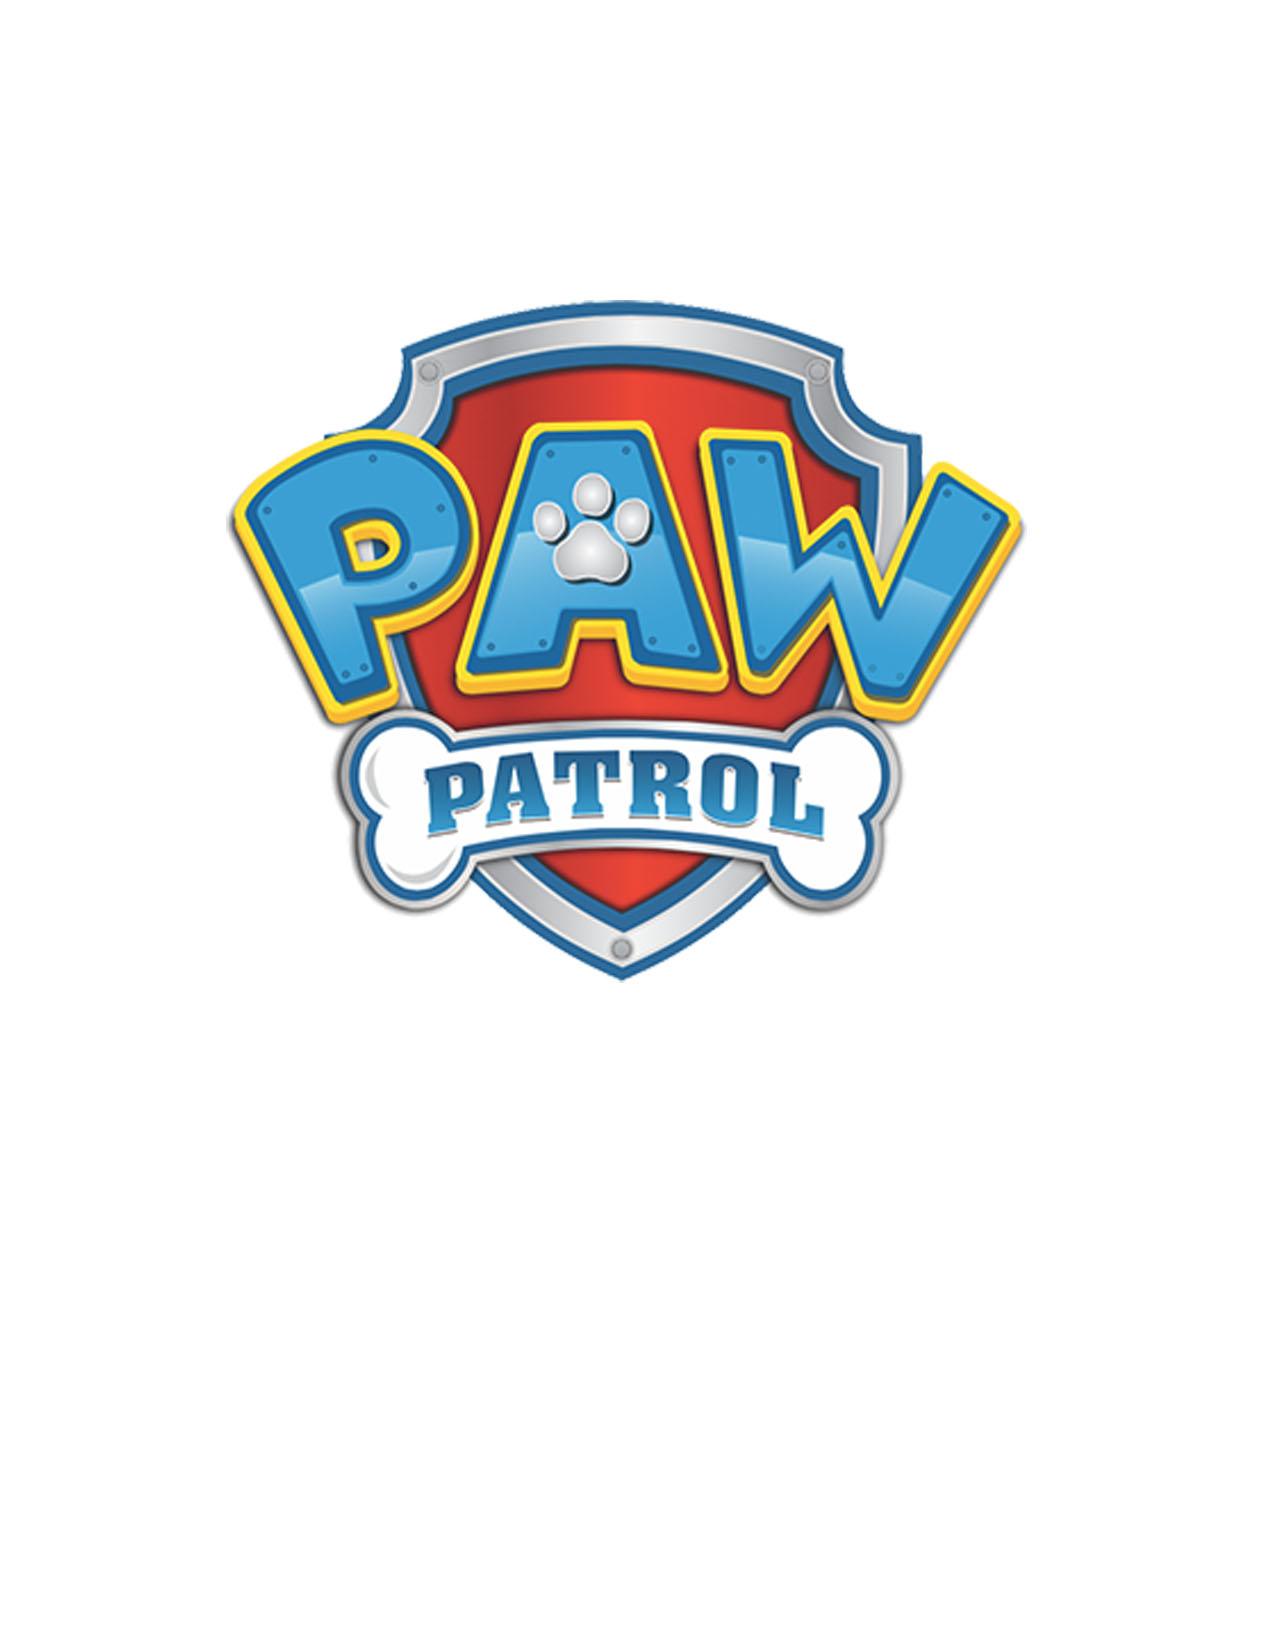 photo relating to Paw Patrol Logo Printable called Paw patrol printable Trademarks